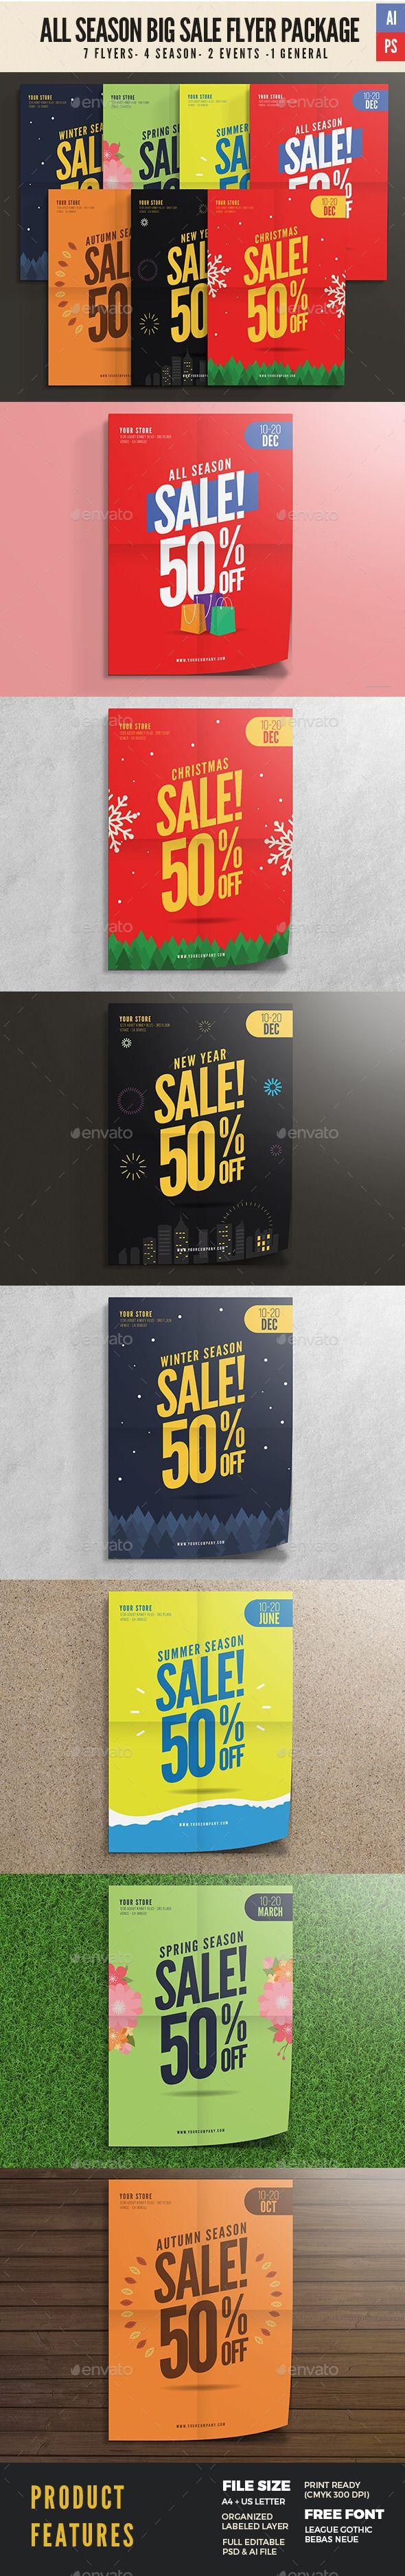 Design large banner in illustrator - All Season Big Sale Flyer Package Sale Postersale Signageai Illustratorfashion Eventsbanner Designflyer